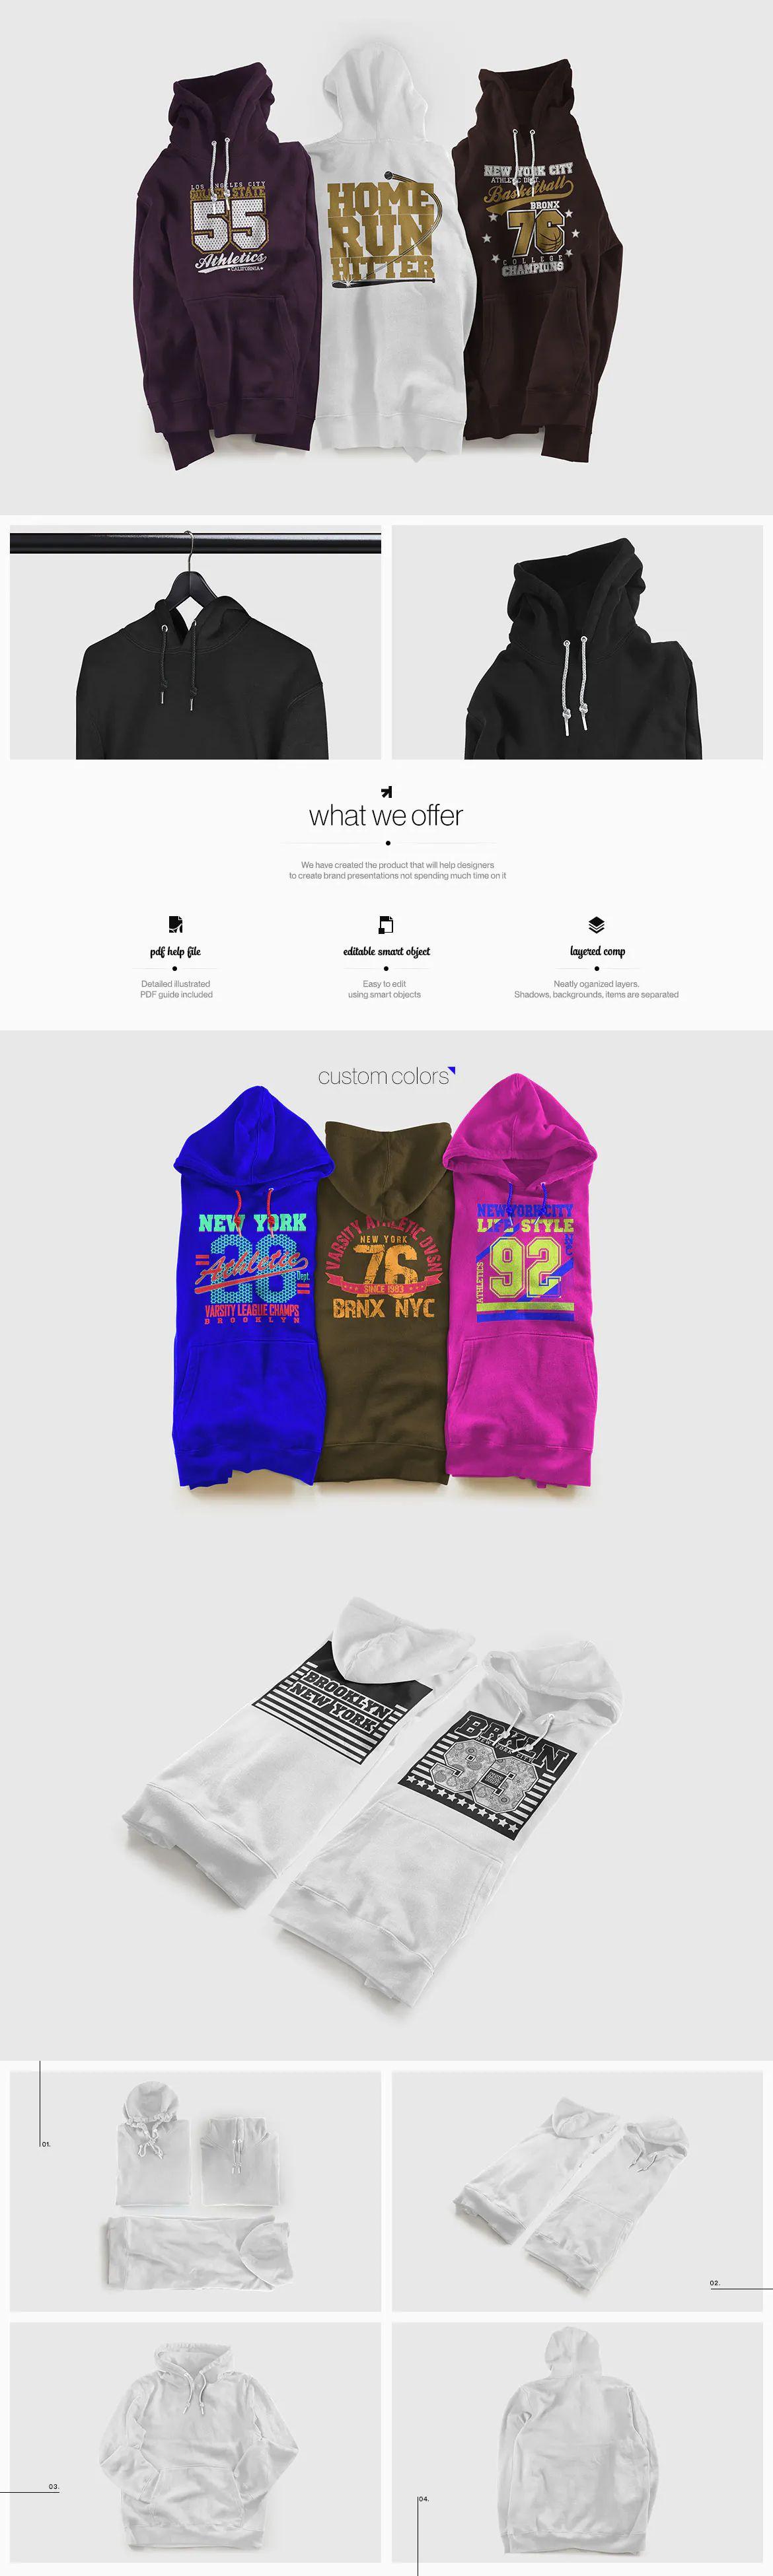 Download Color Hoodie Sweatshirt Mockup By Bangingjoints On Envato Elements Sweatshirts Hoodie Sweatshirts Hoodies